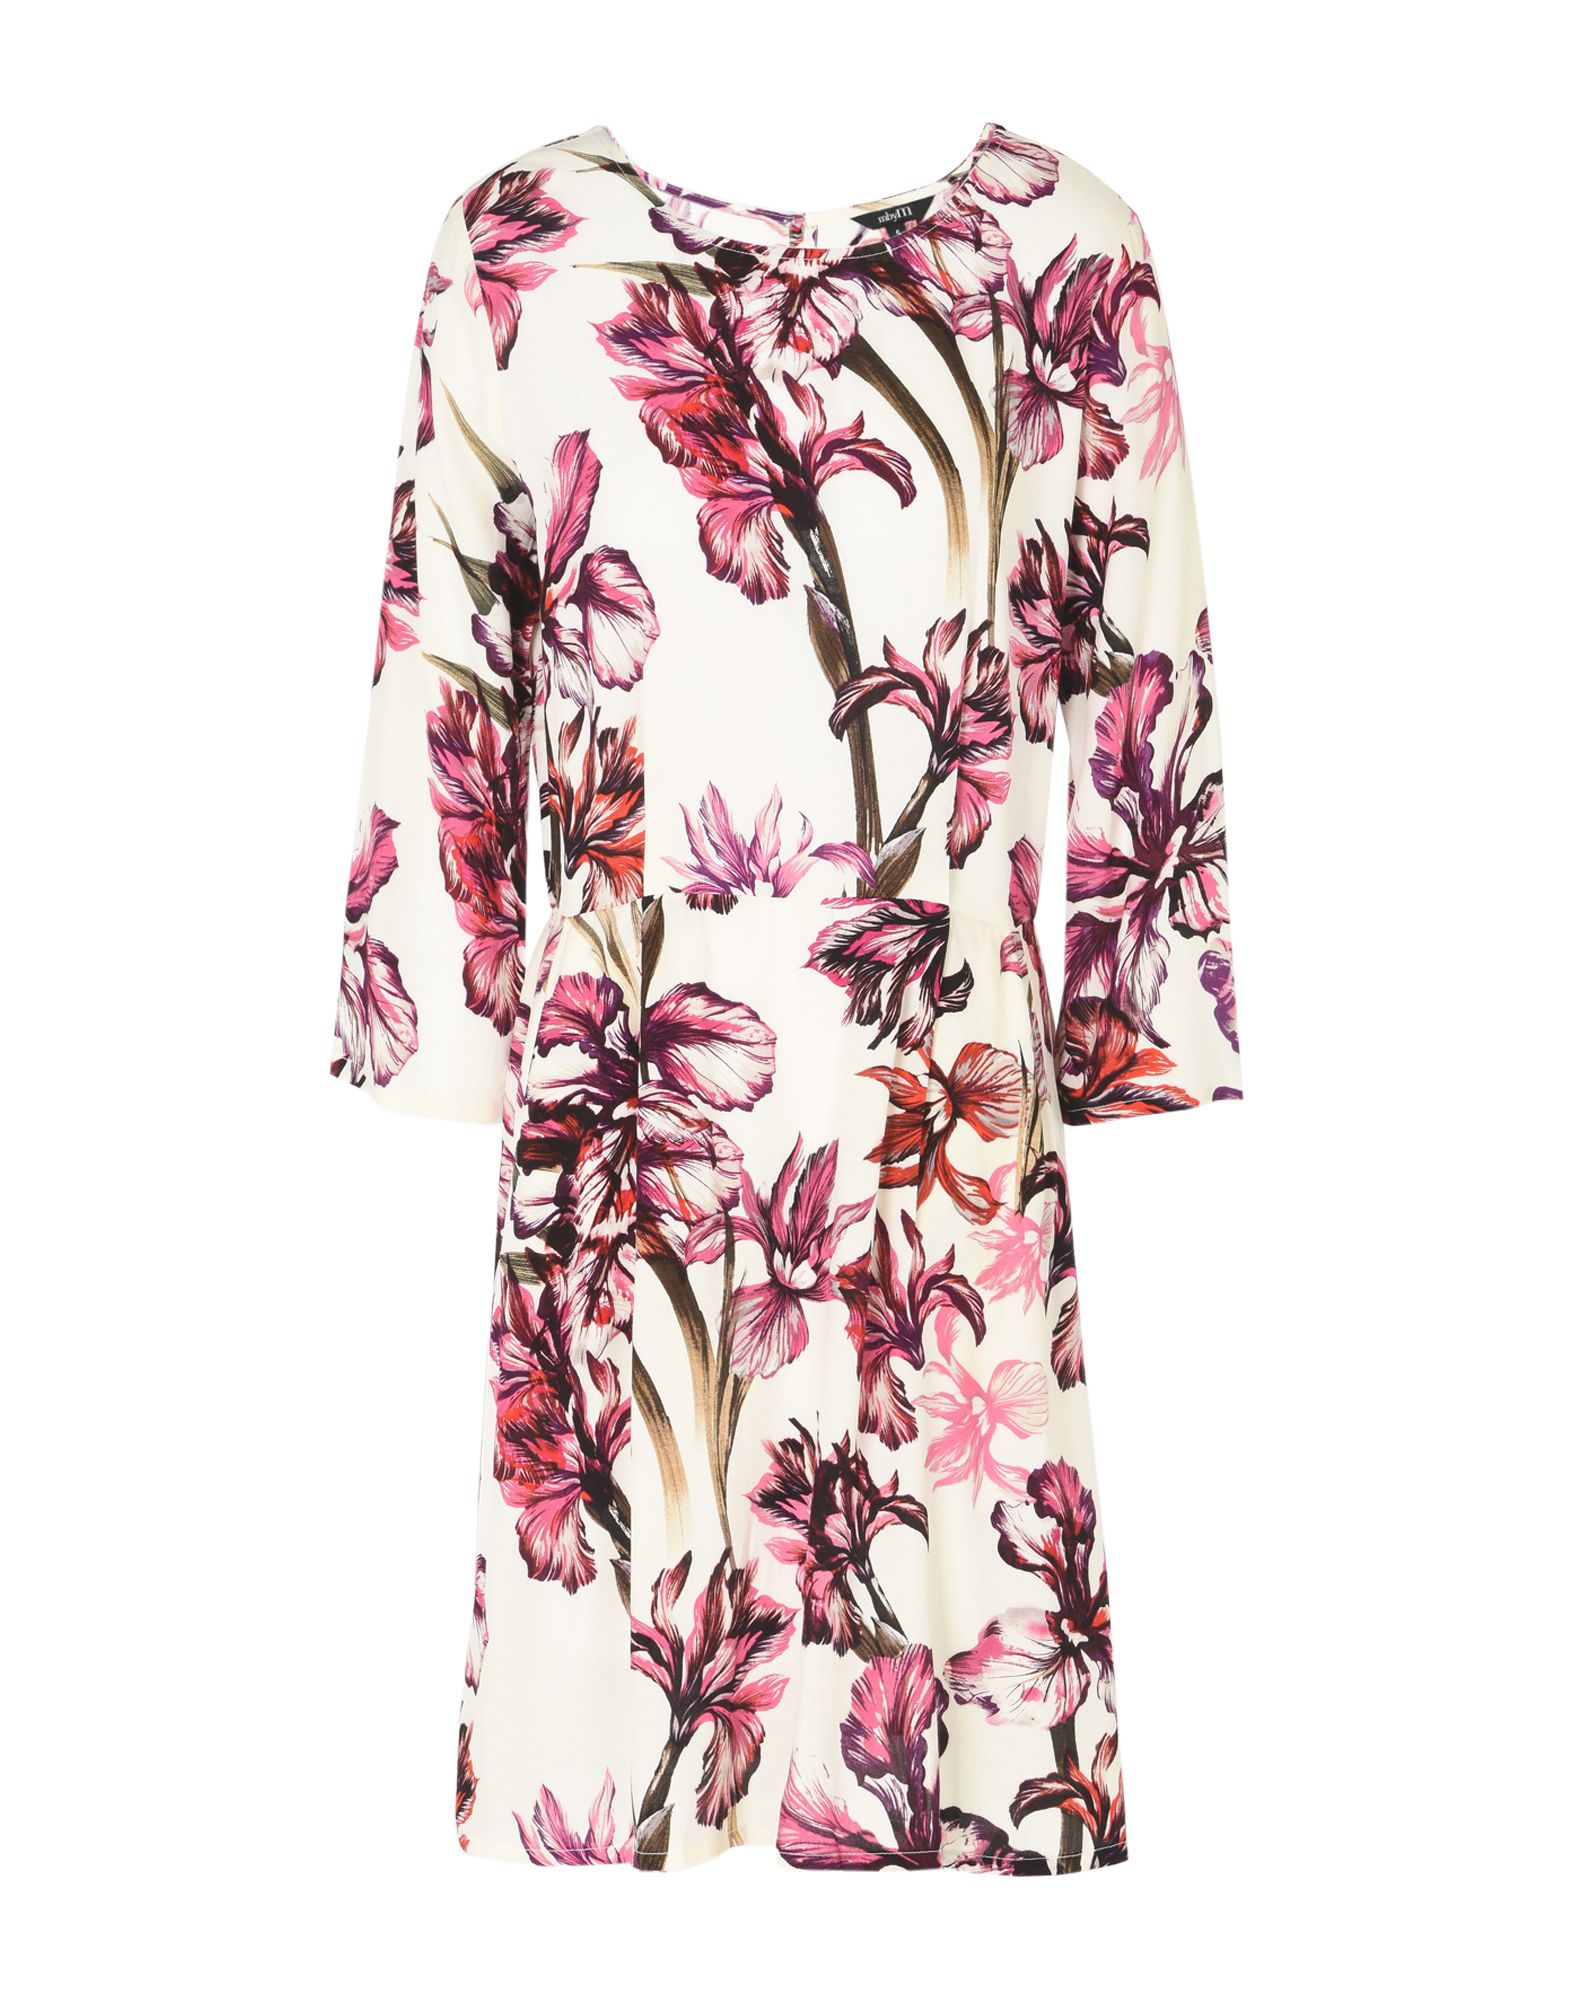 MBYM Short Dress in Light Purple